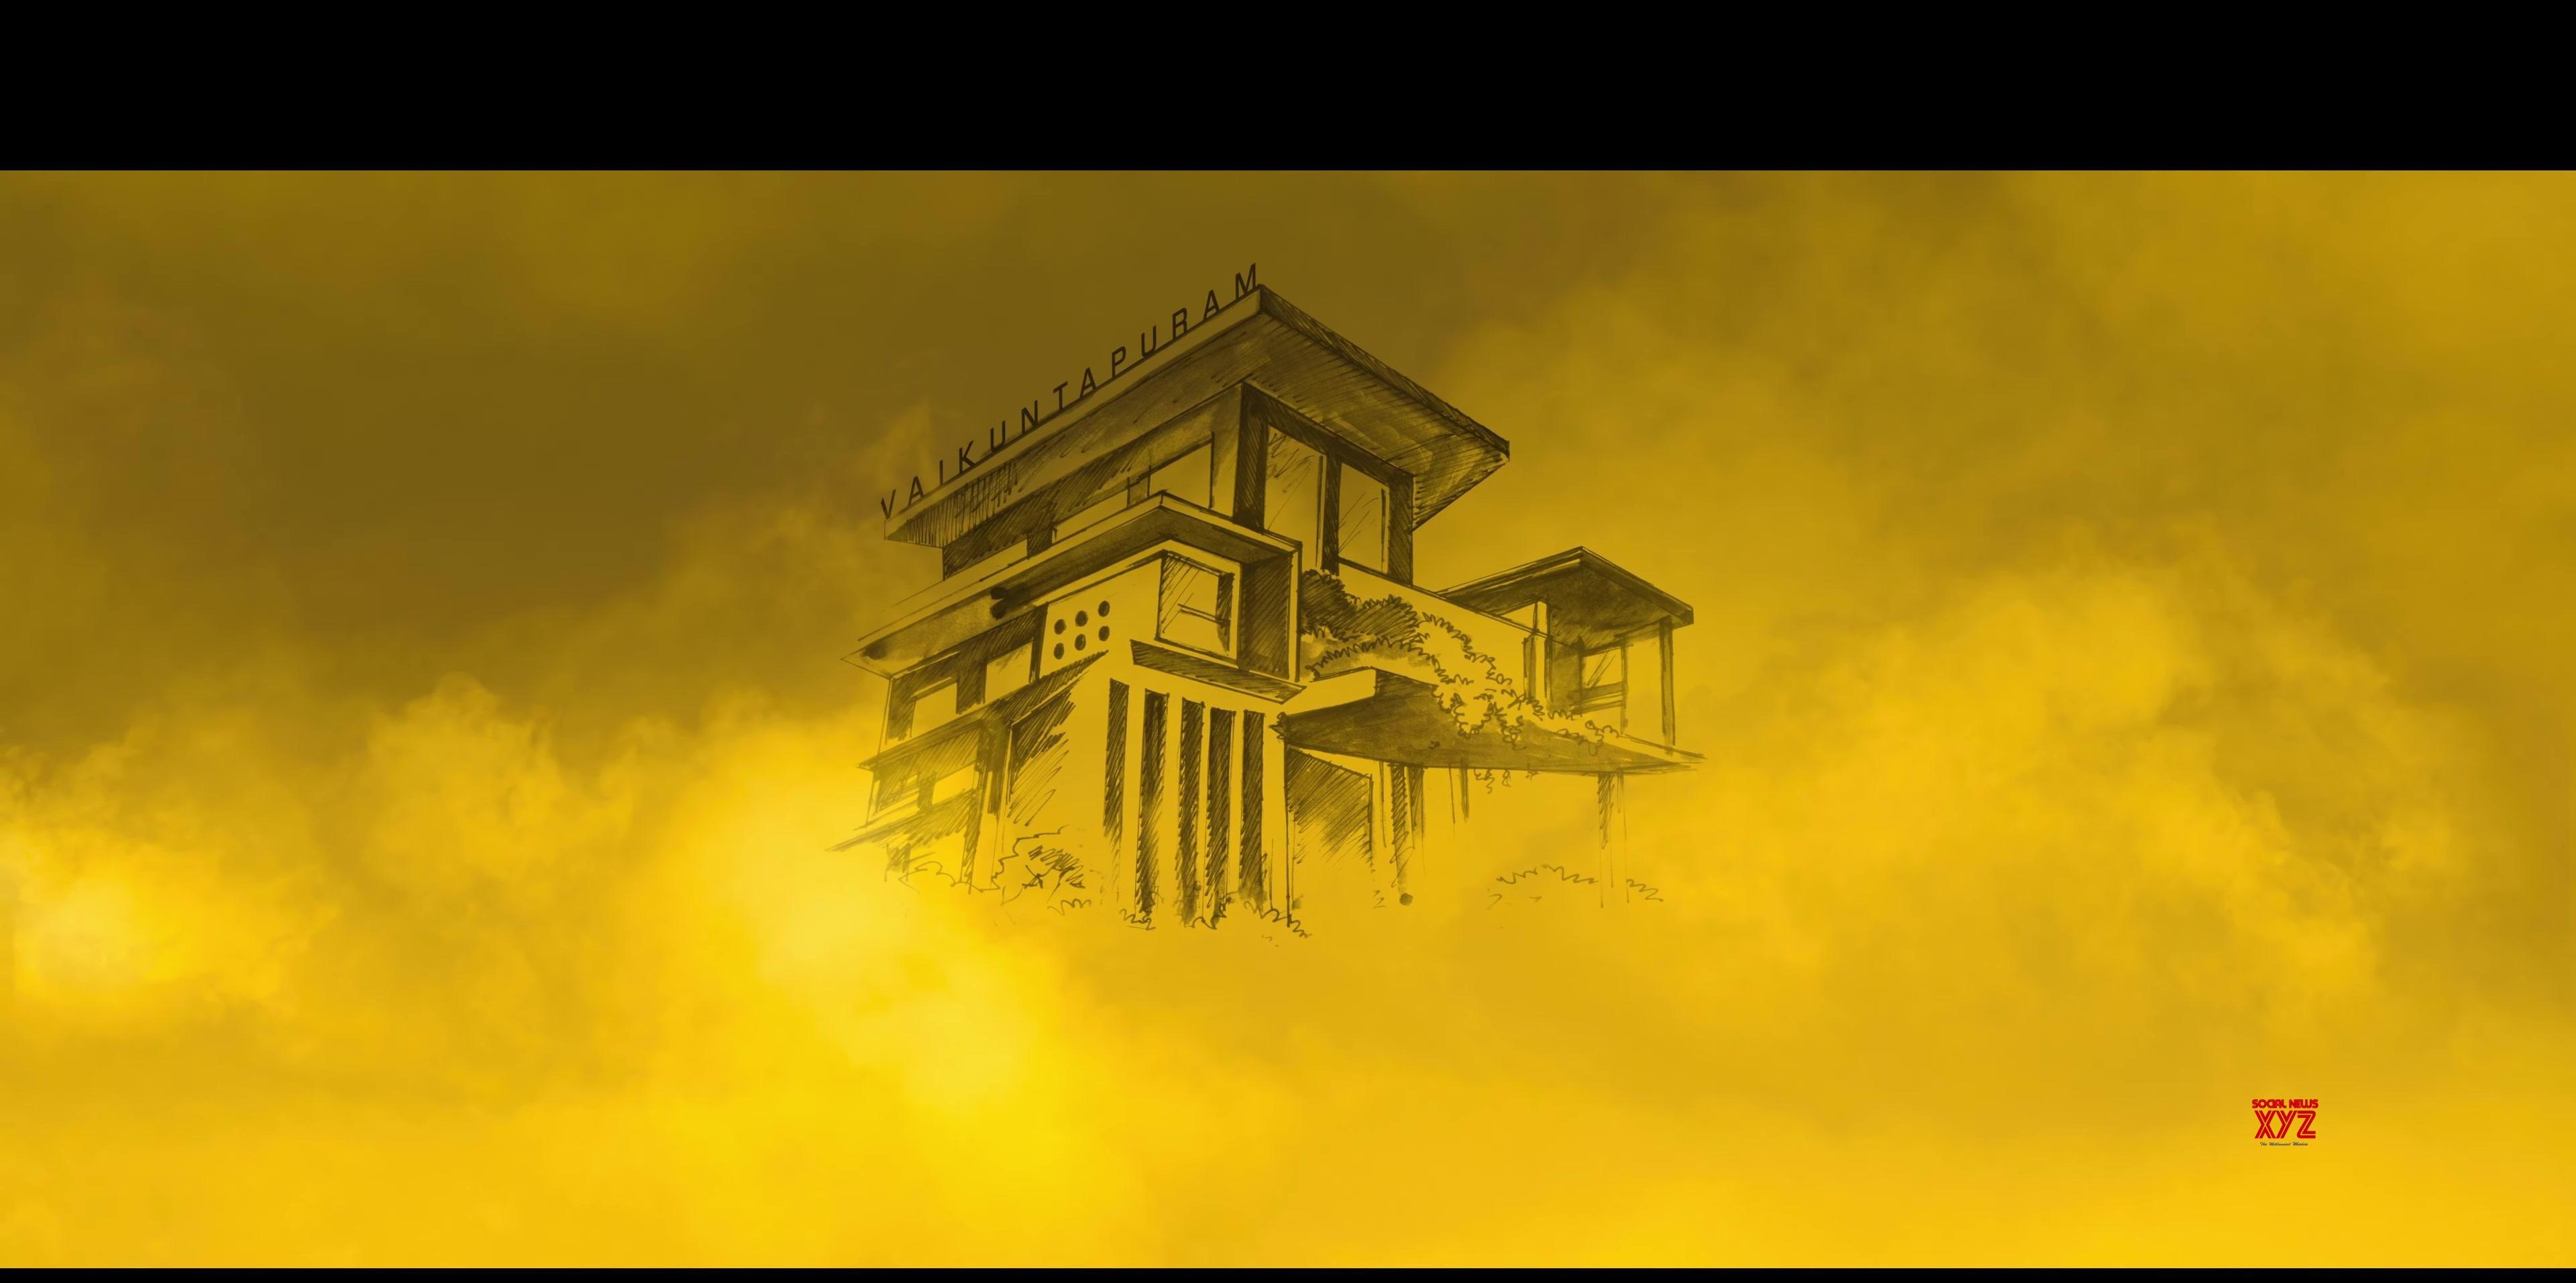 Allu Arjun And Trivikram's Ala Vaikunthapuramulo First Glimpse Stills